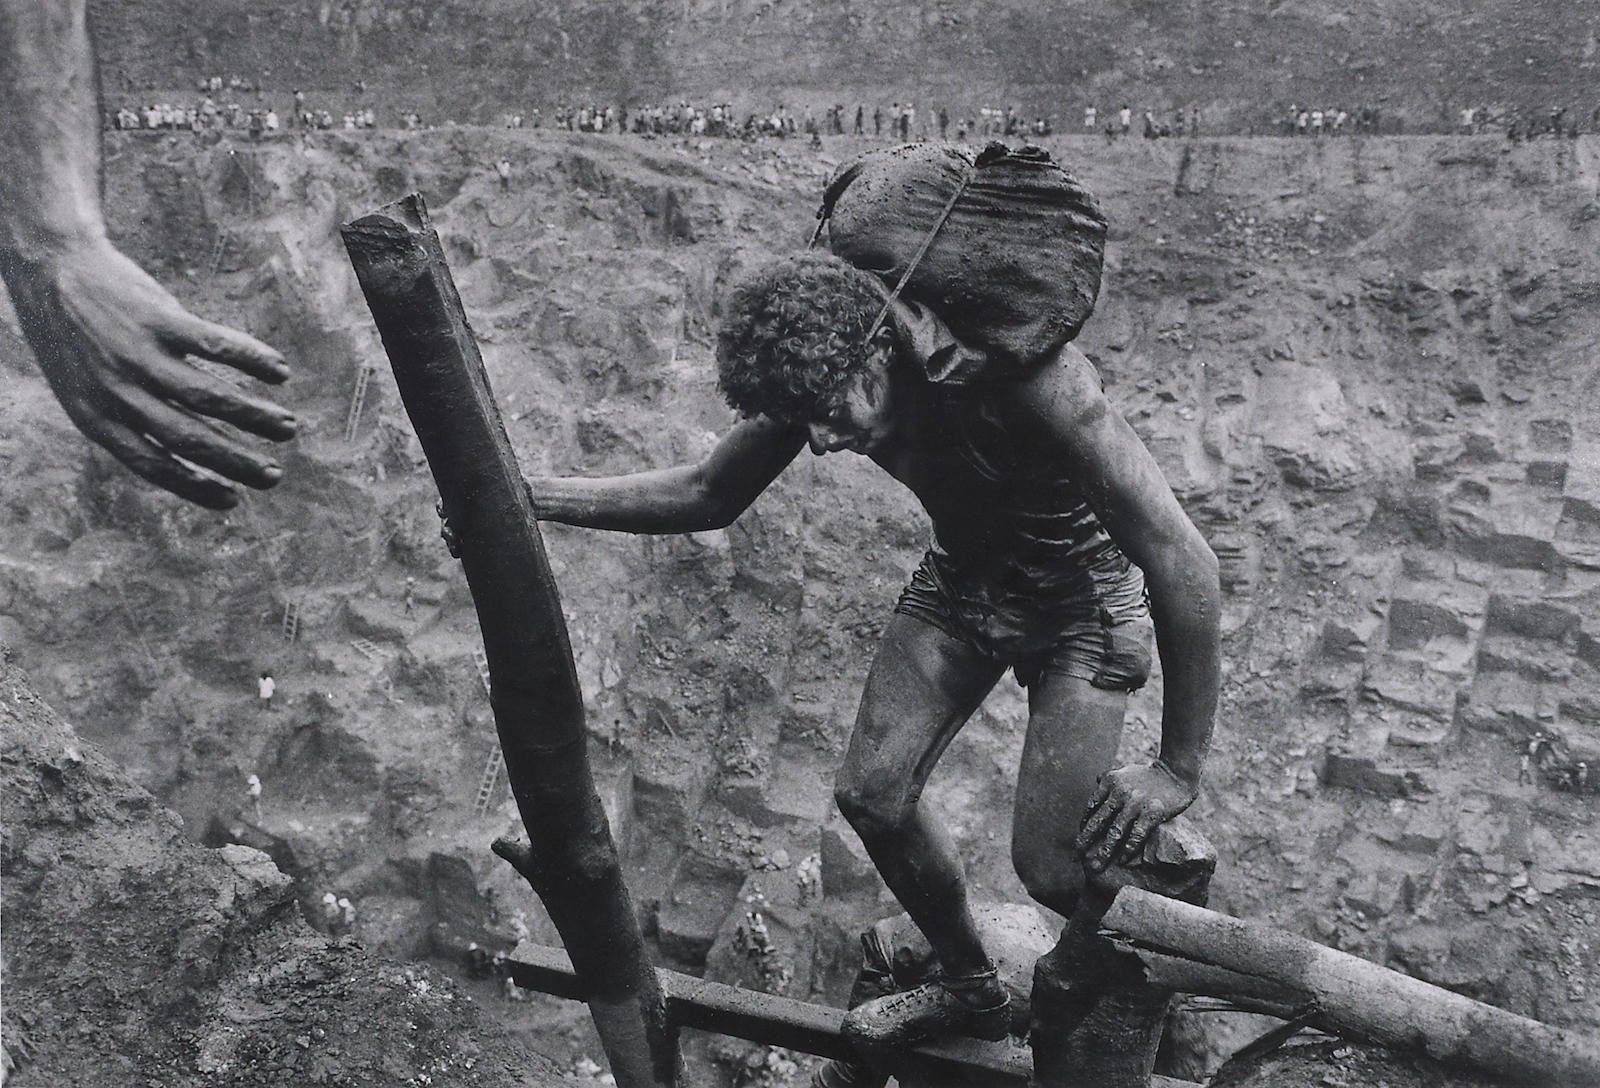 Рабочий на руднике Серра Пелада, Бразилия, 1986. Автор Себастьян Сальгадо